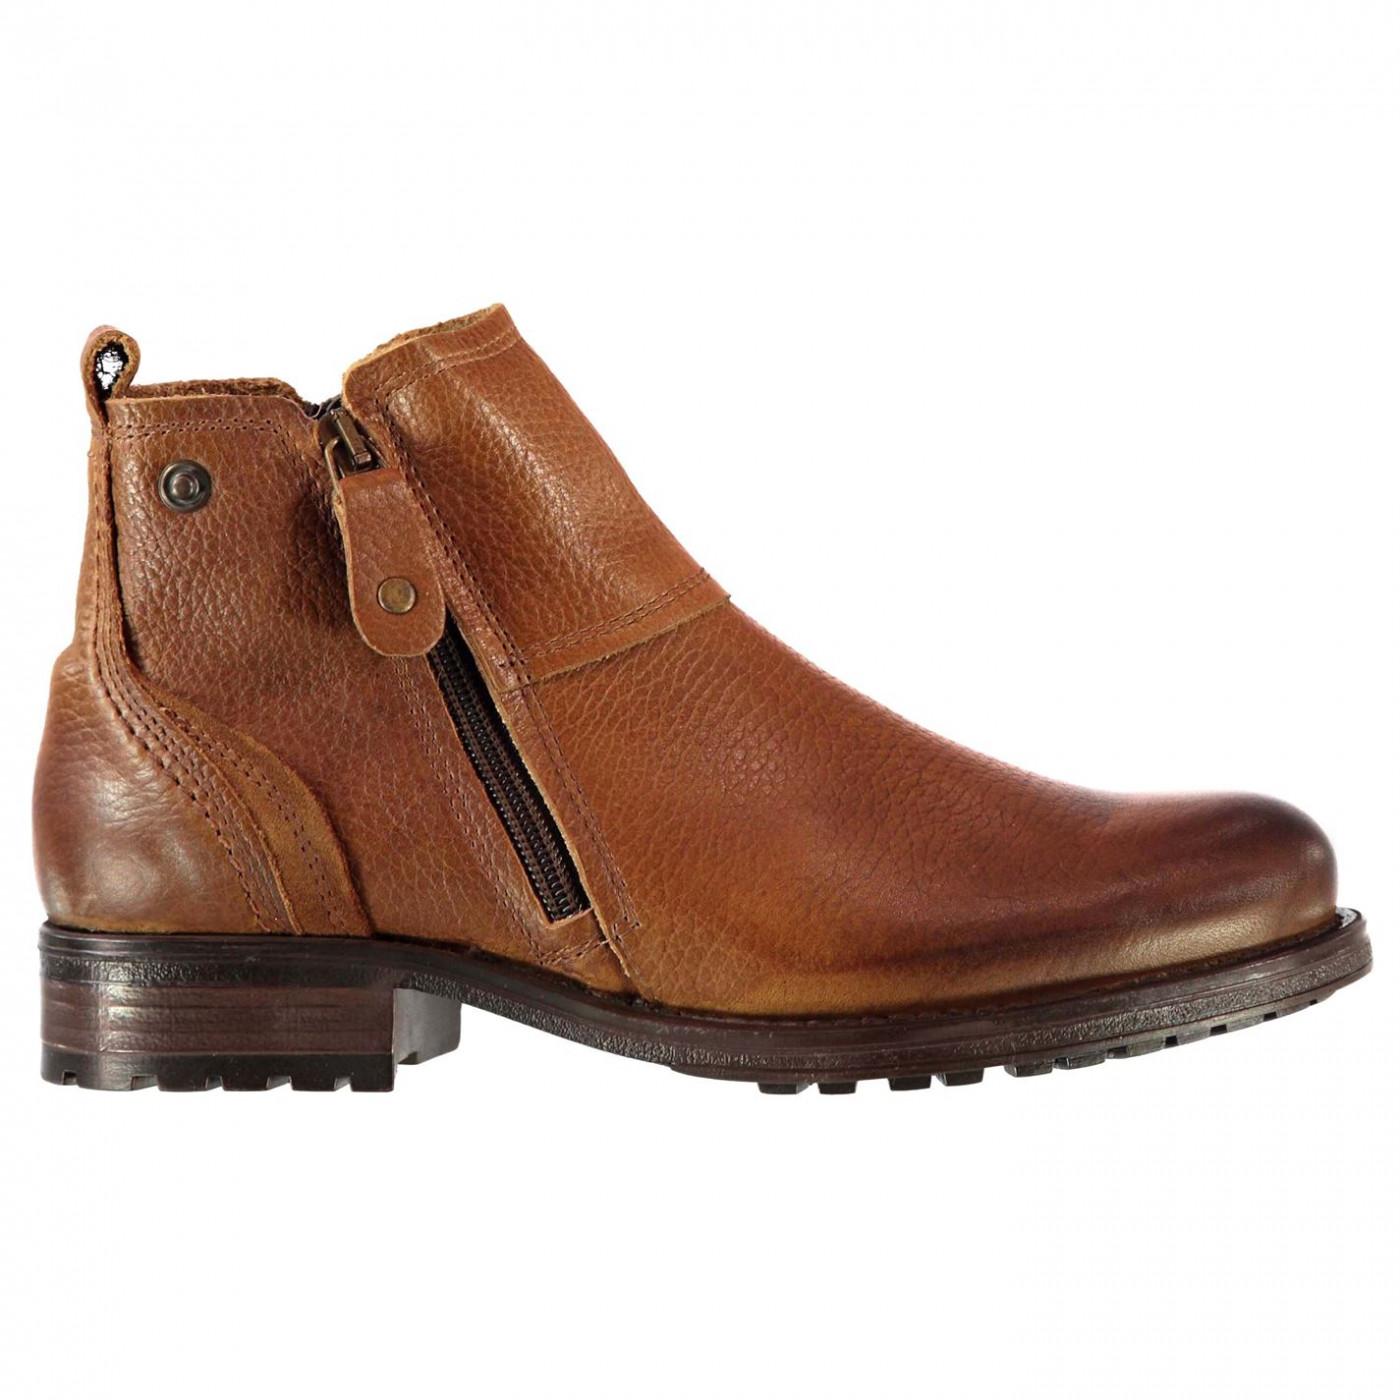 Firetrap Jinx Junior Boys Boots